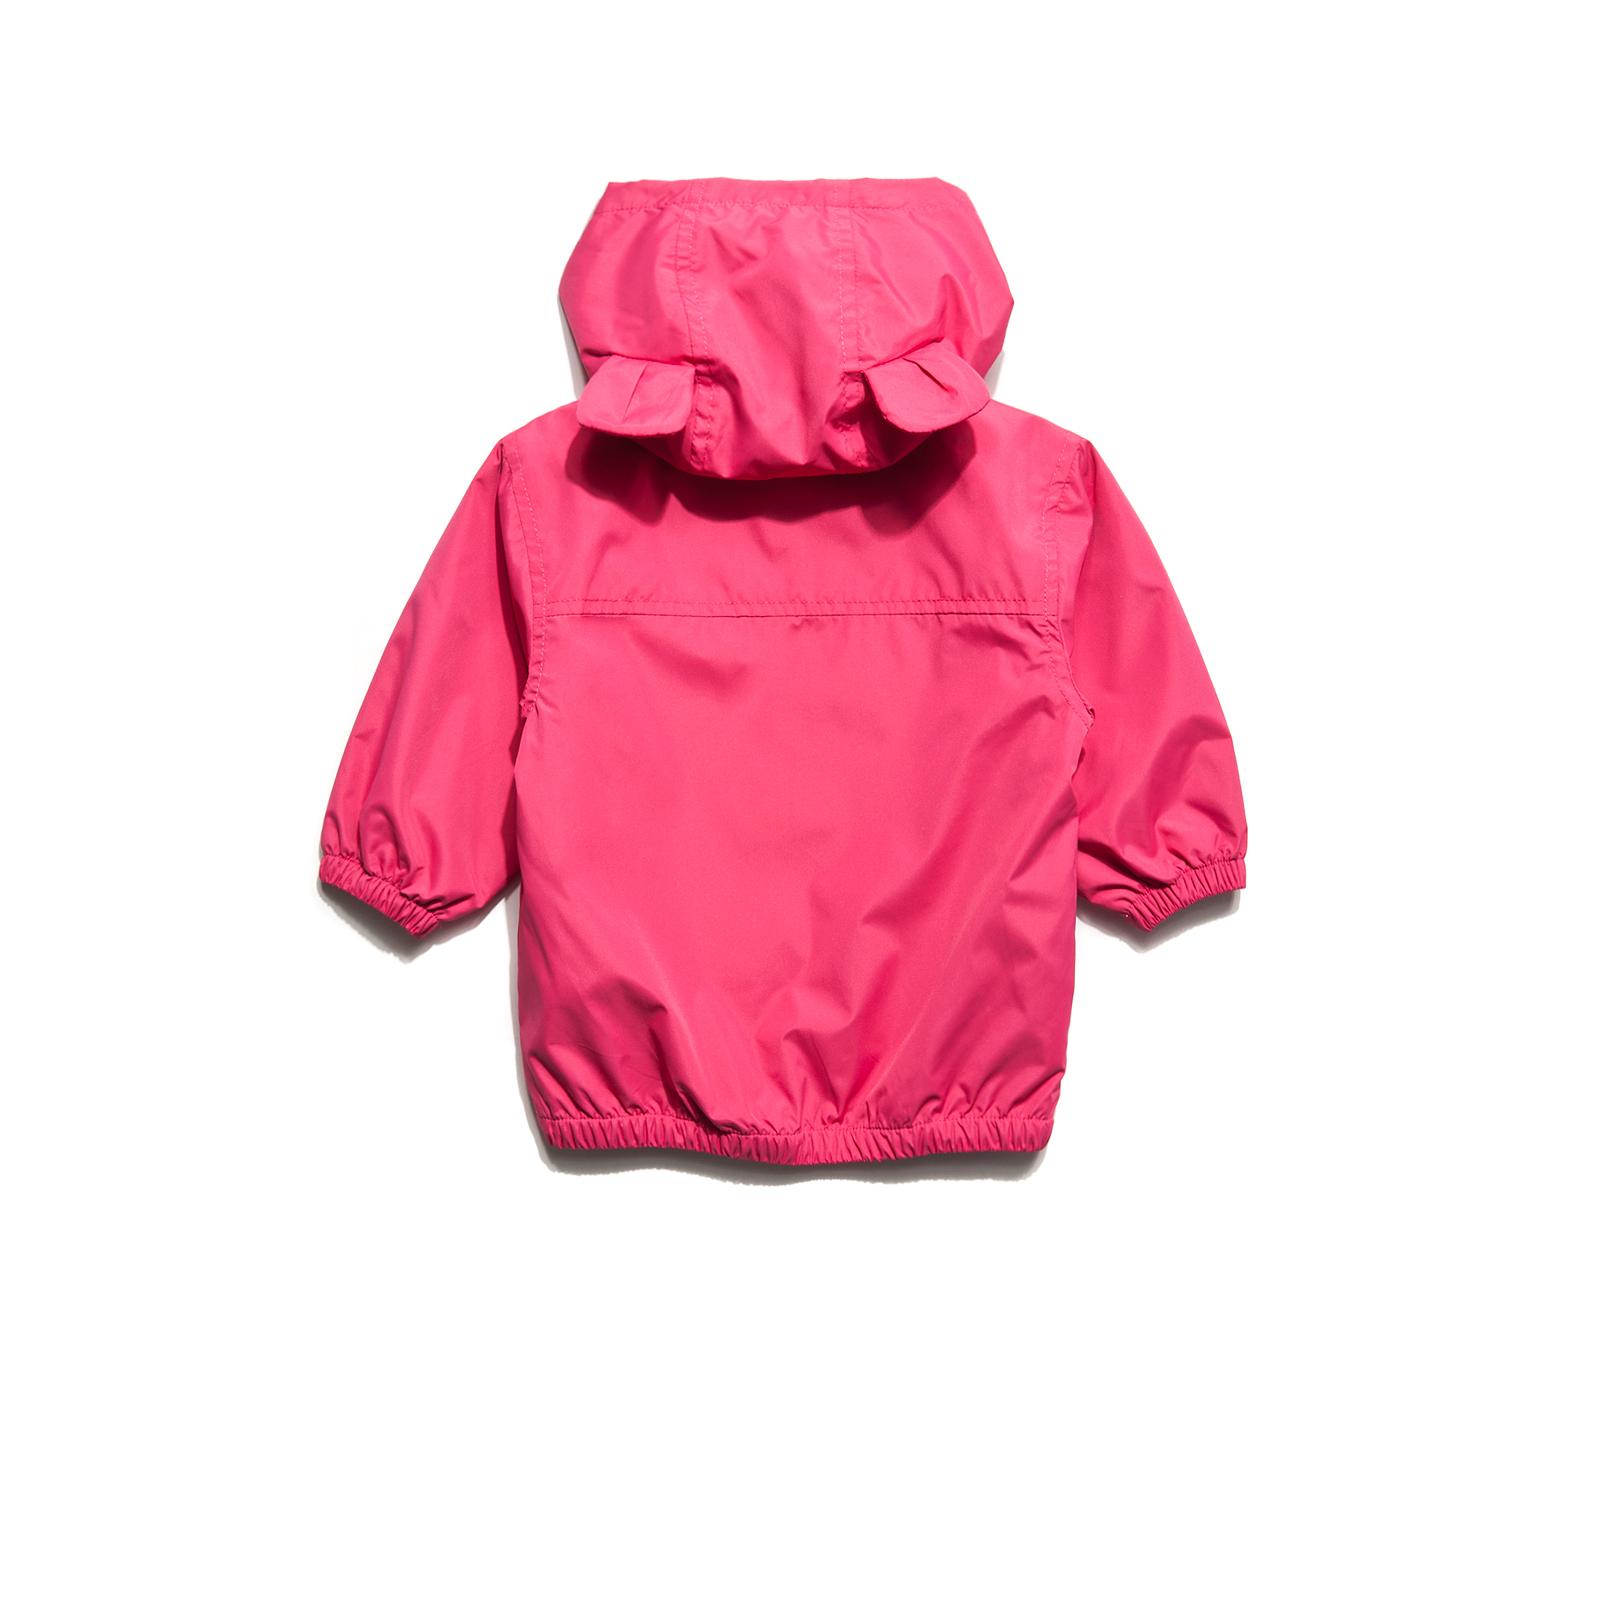 Куртка 5.10.15. Размер 80 от Младенец.ru